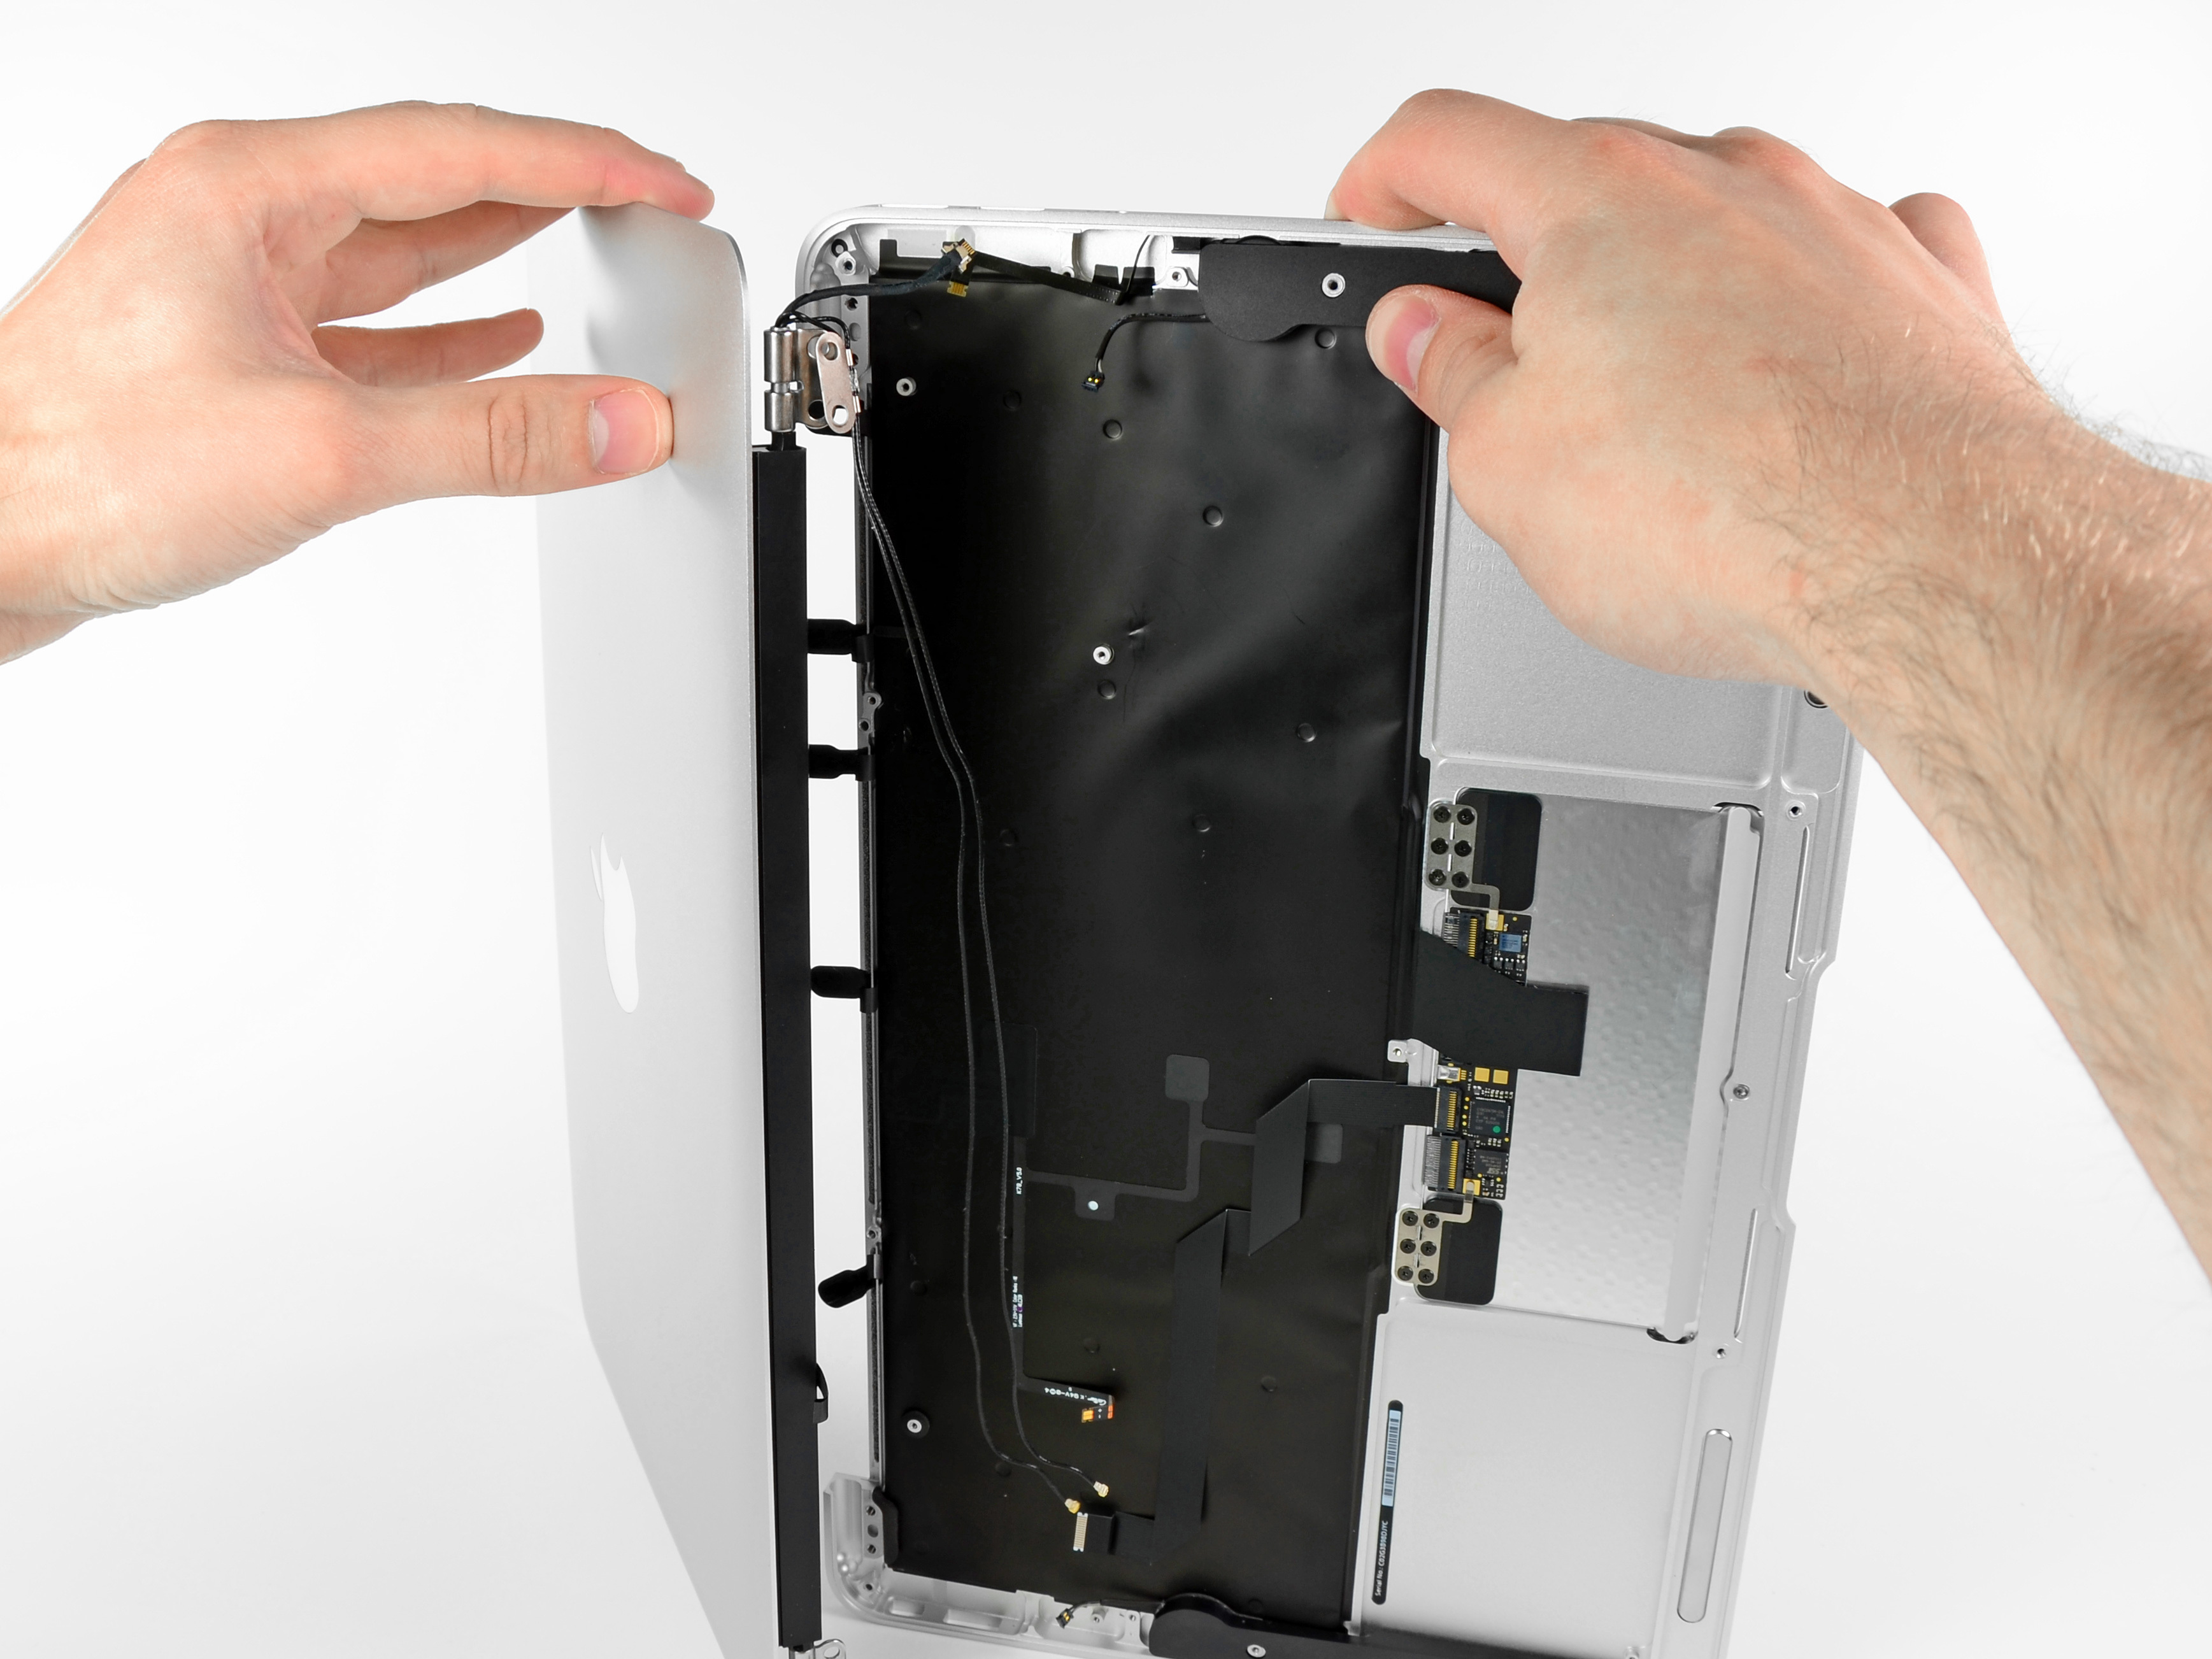 macbook air 11 mid 2012 repair ifixit rh ifixit com Take Apart MacBook Air iFixit MacBook Air Tear Down